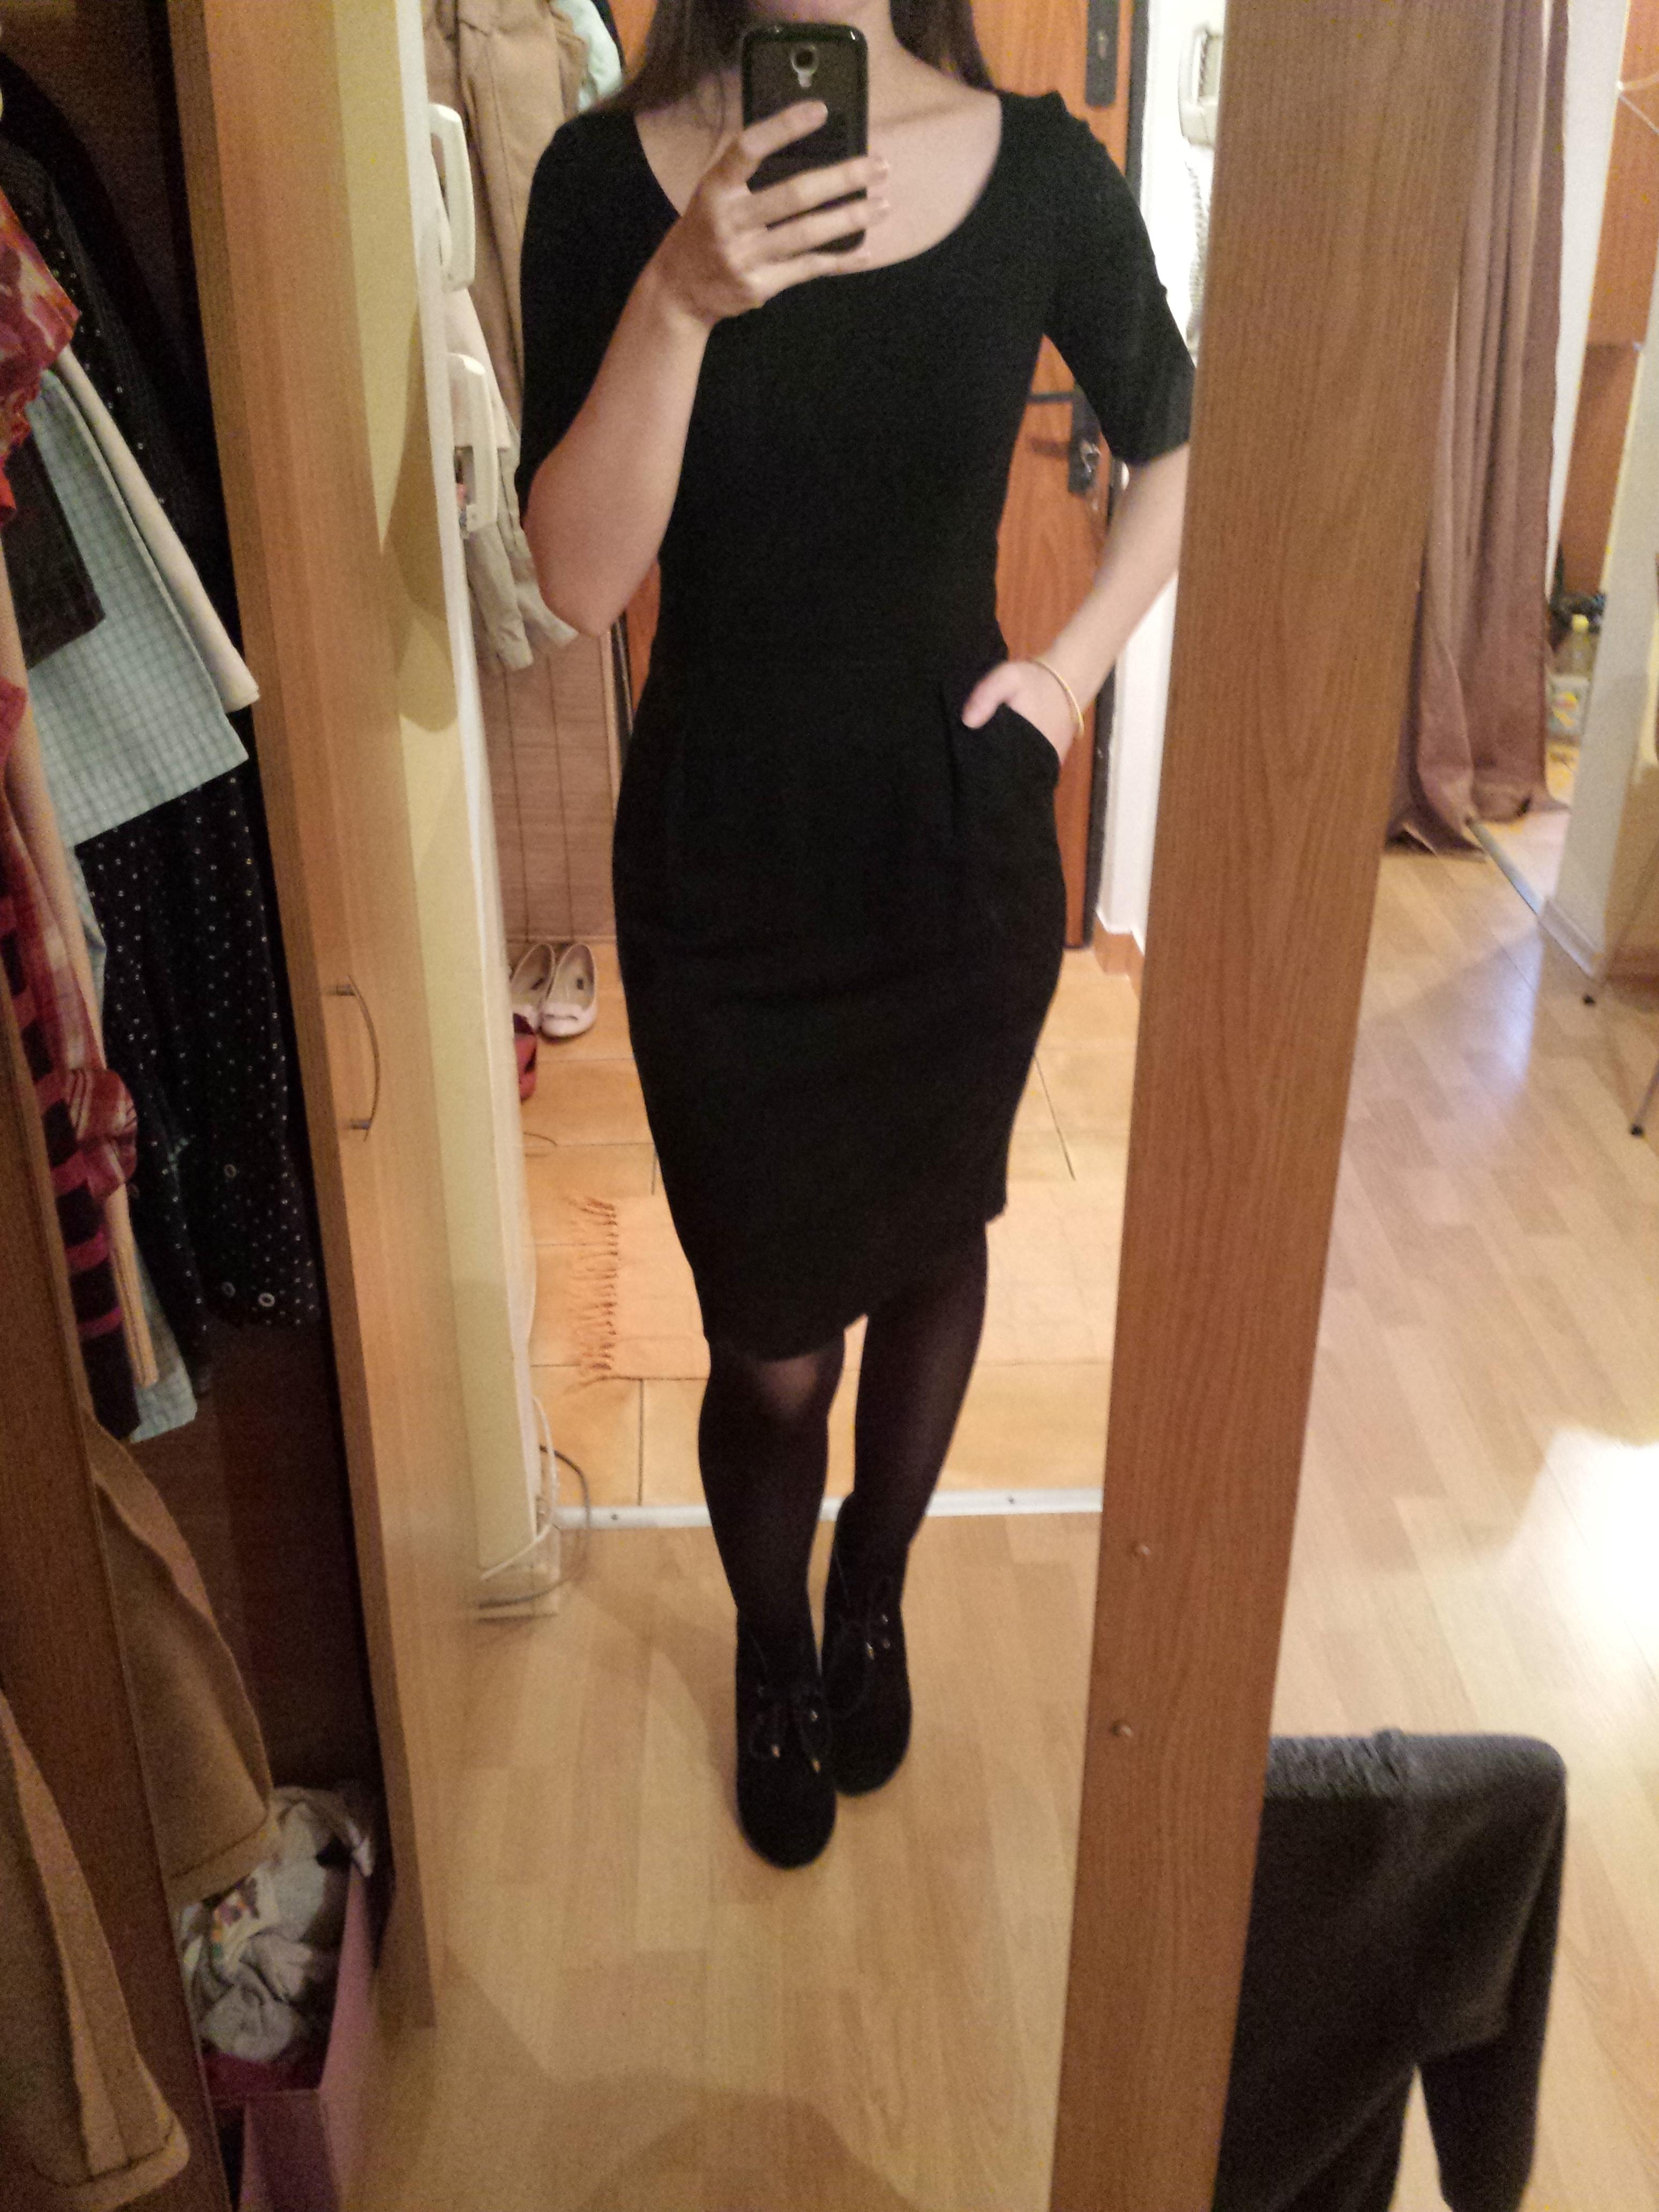 outfit advice amp feedback oct 23rd femalefashionadvice